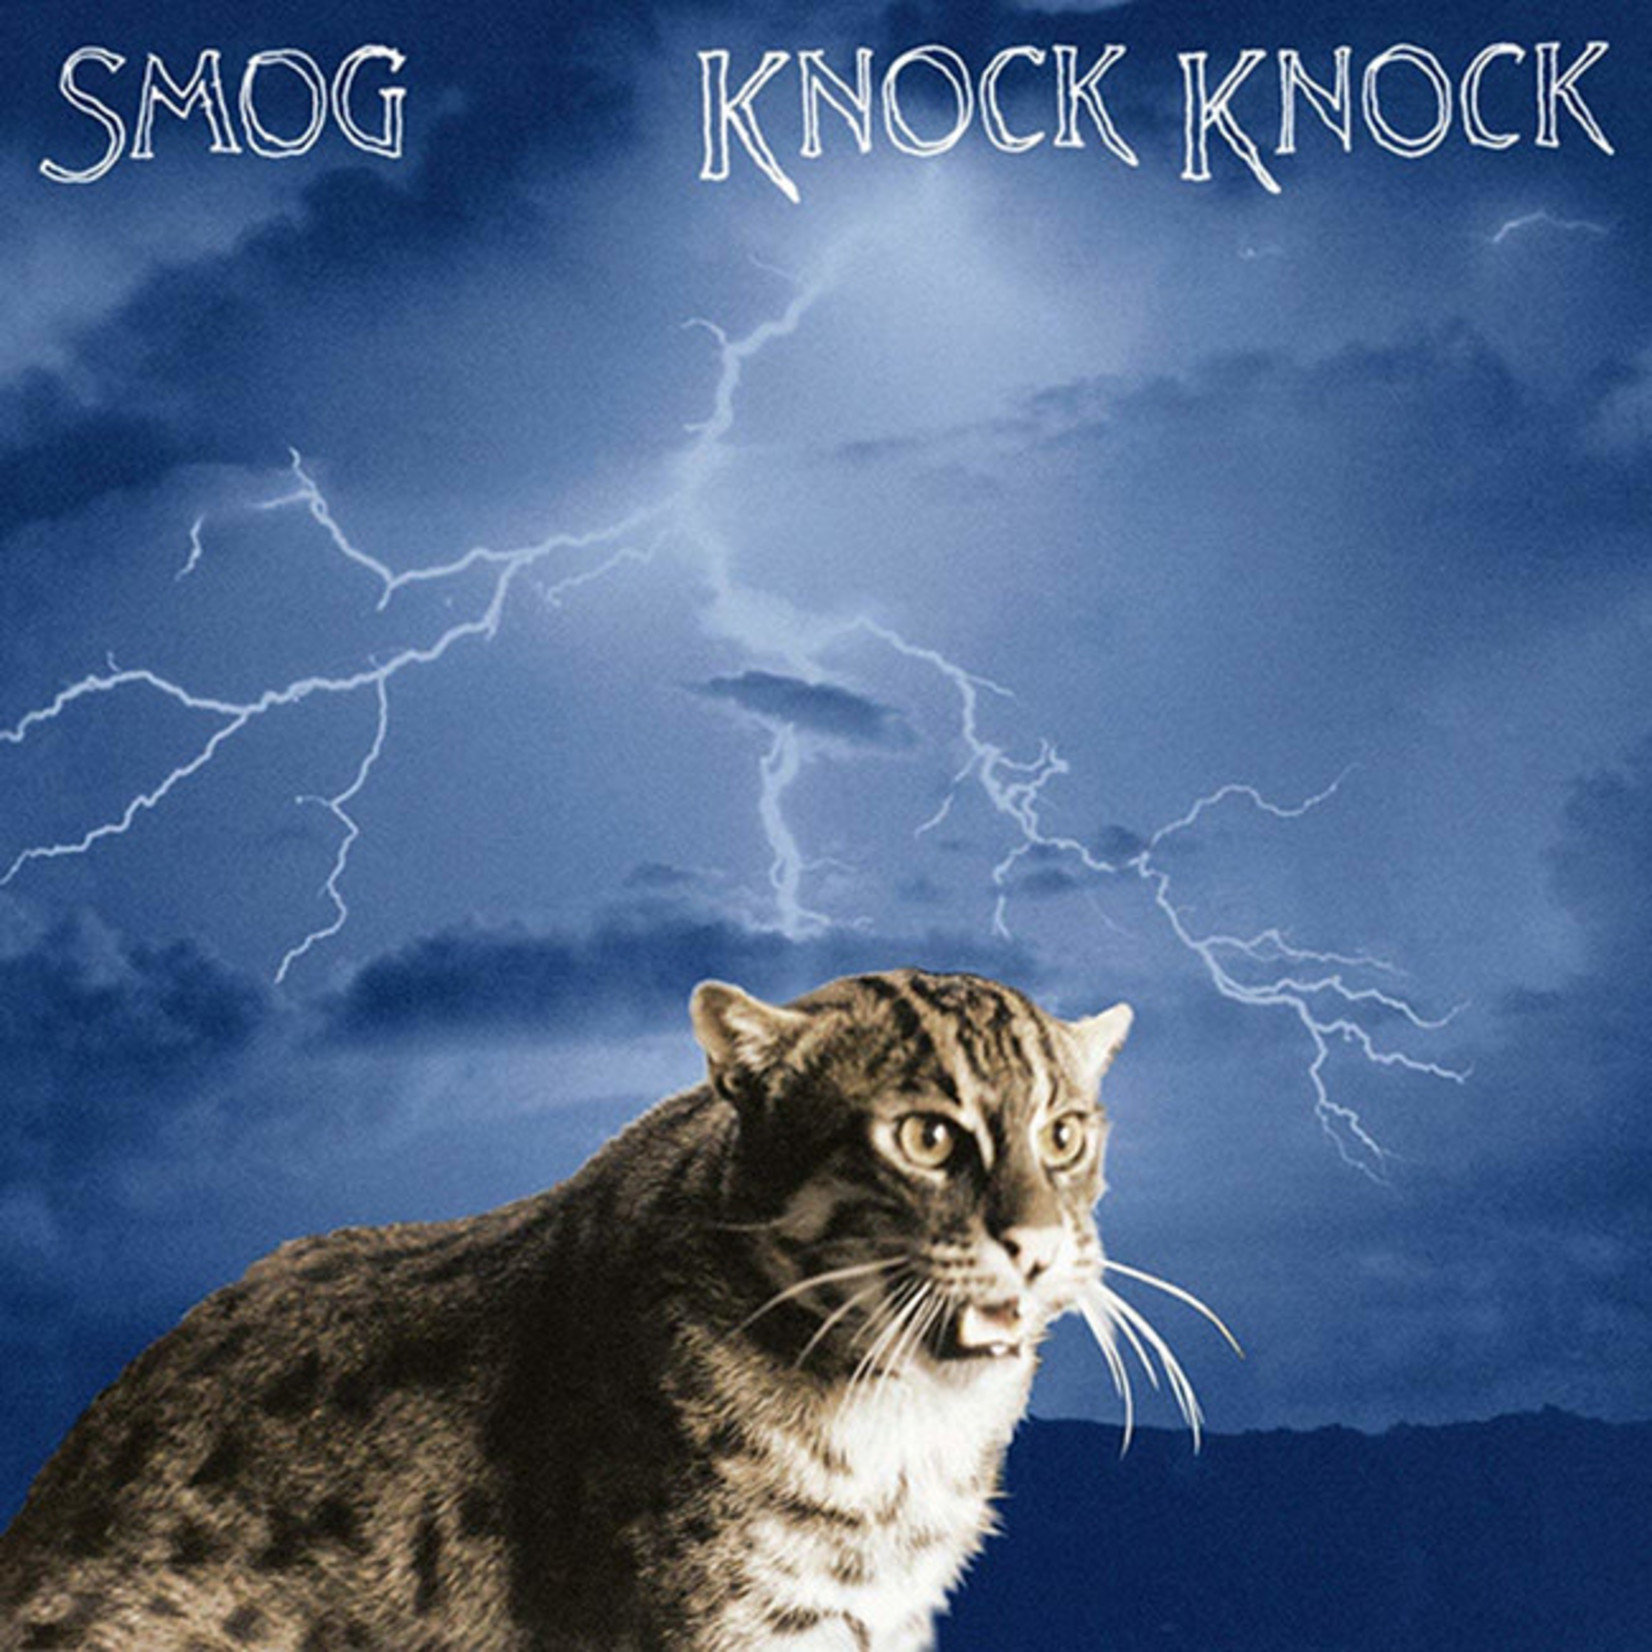 [New] Smog: Knock Knock (half-speed remaster)